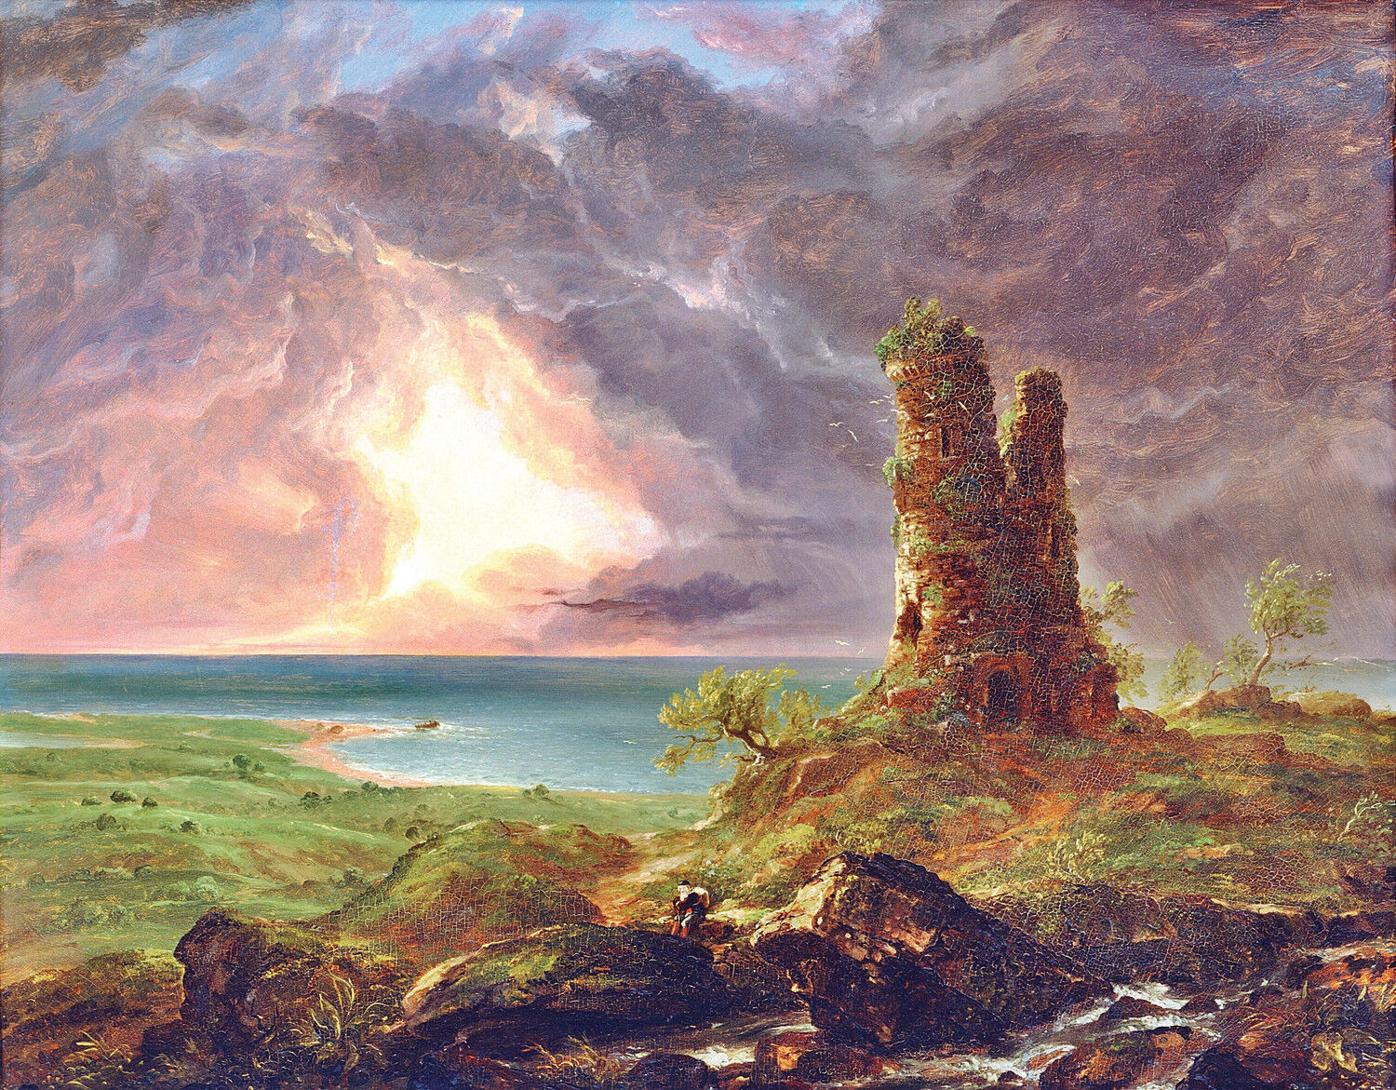 Understanding American art by looking across the pond